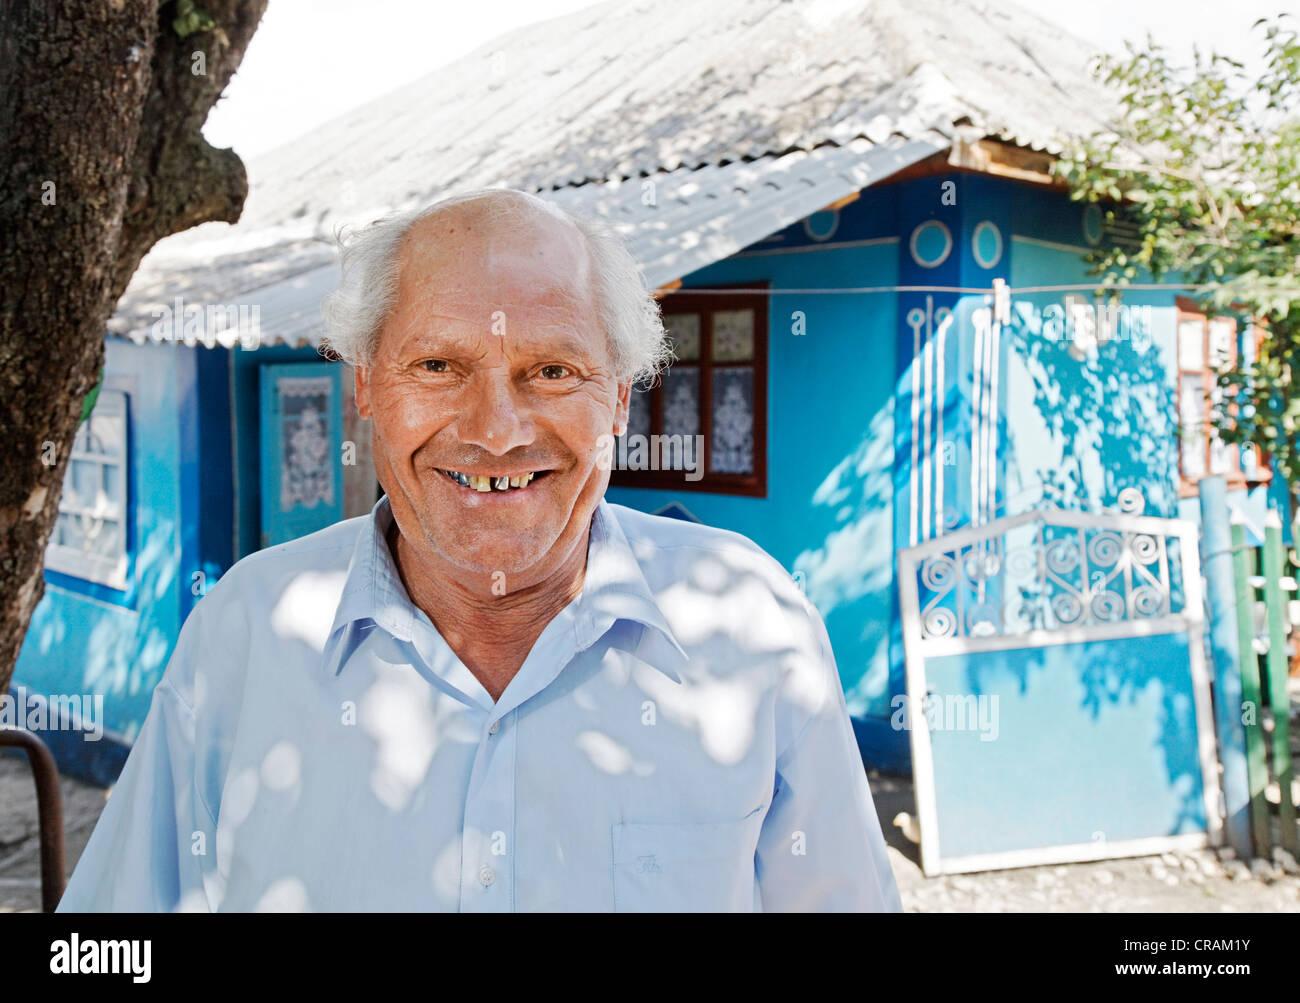 Victor Cracea, village chief of Mincenii de Jos, Moldova, Southeastern Europe - Stock Image